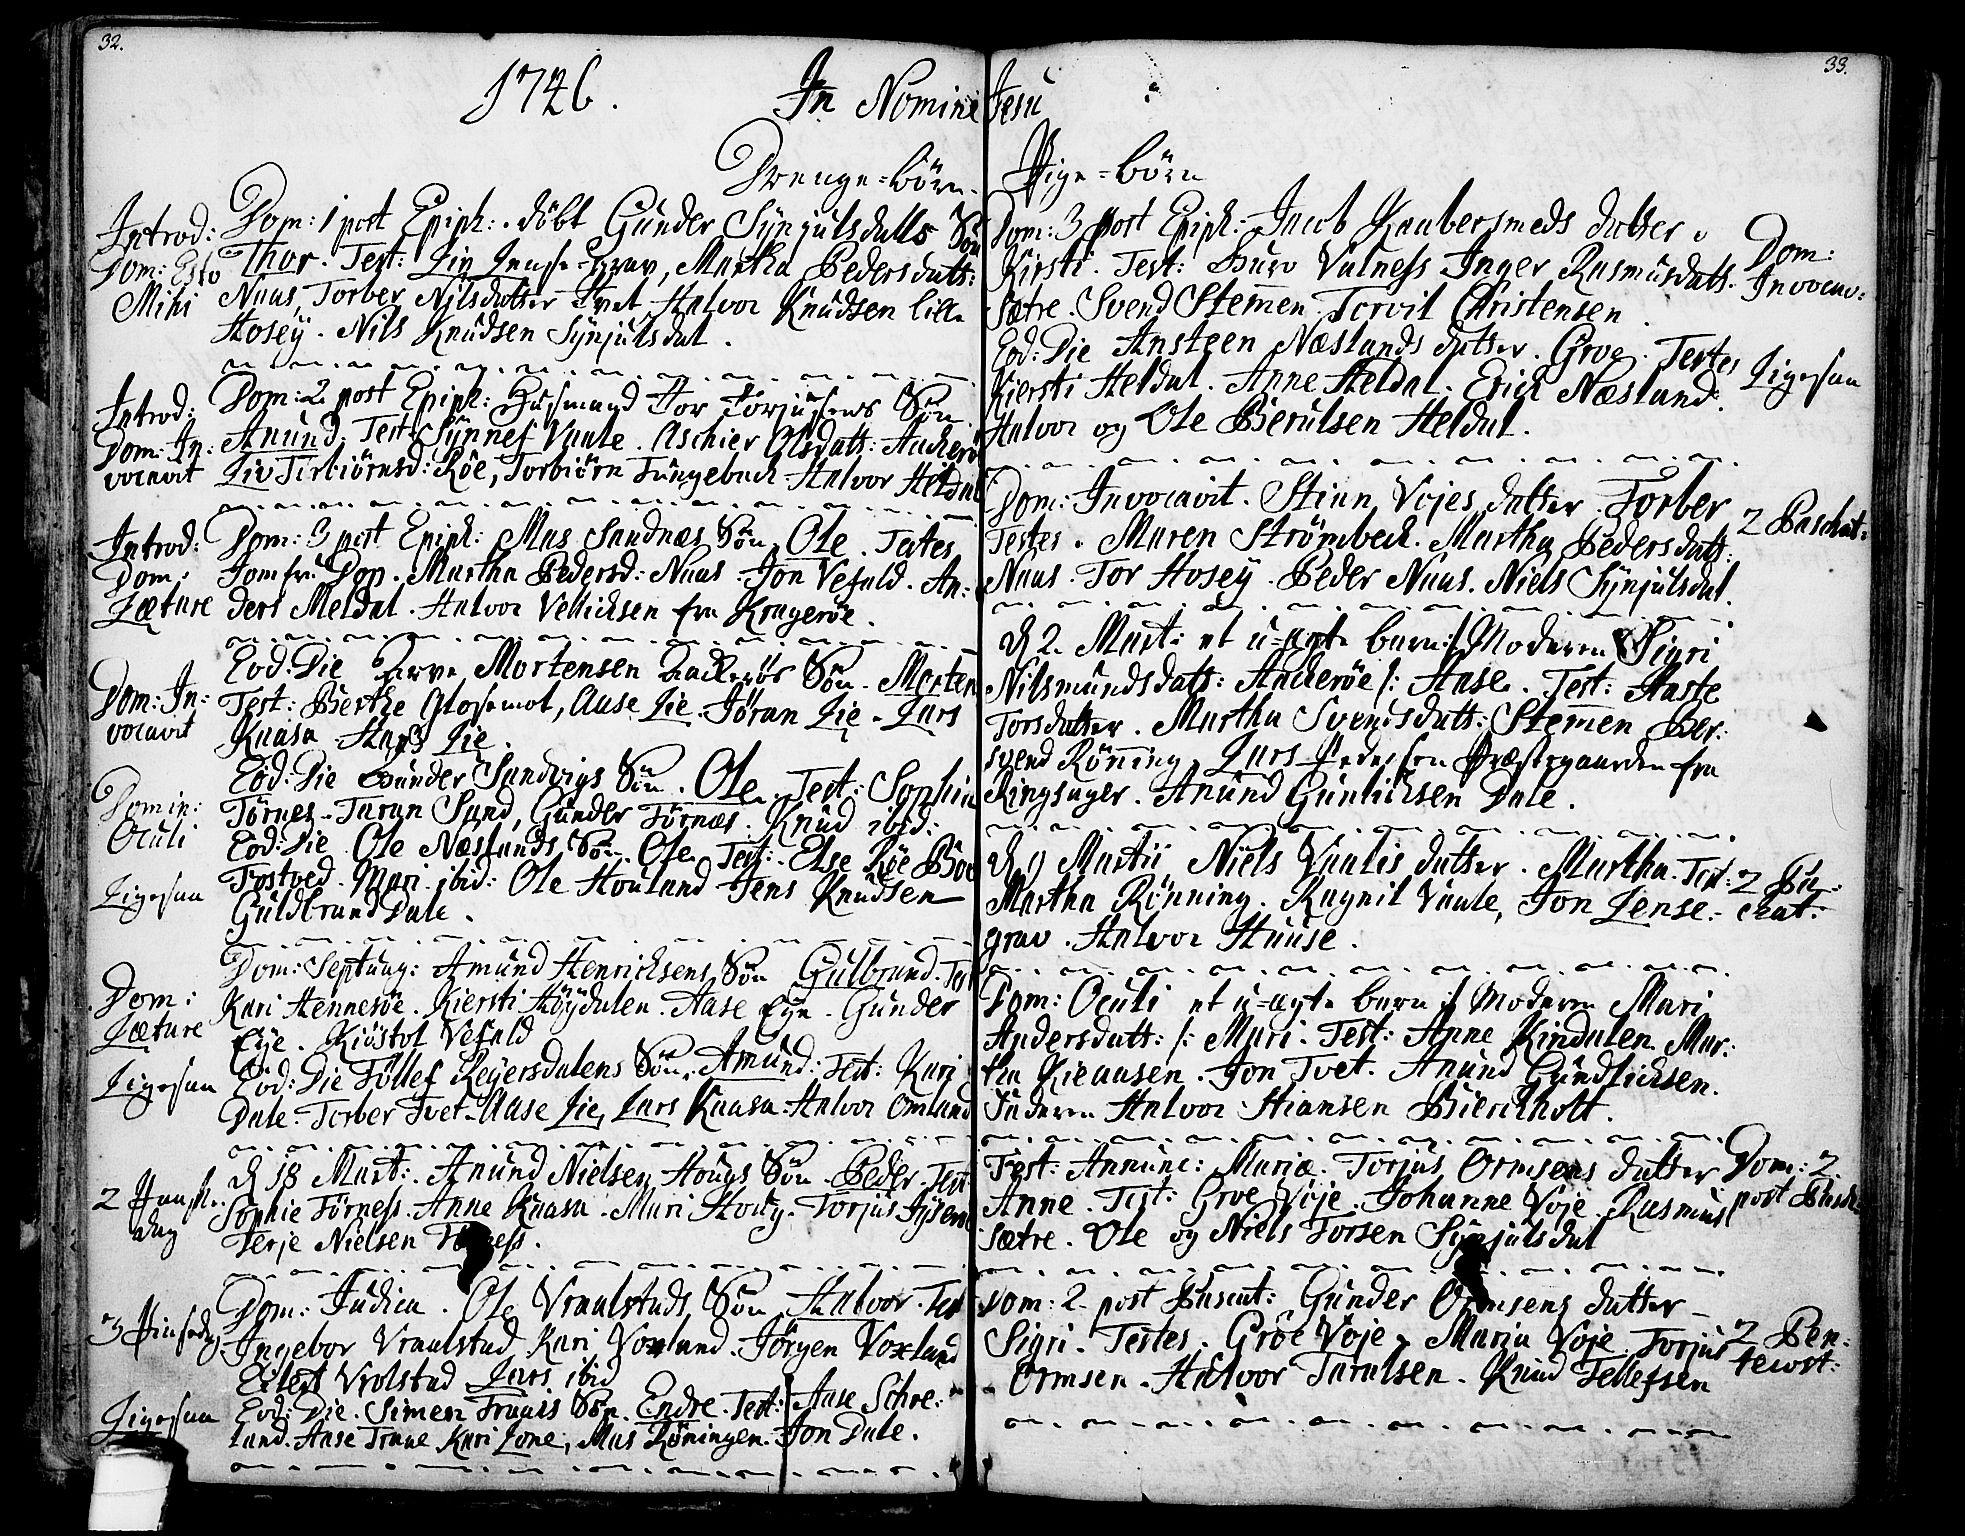 SAKO, Drangedal kirkebøker, F/Fa/L0001: Ministerialbok nr. 1, 1697-1767, s. 32-33